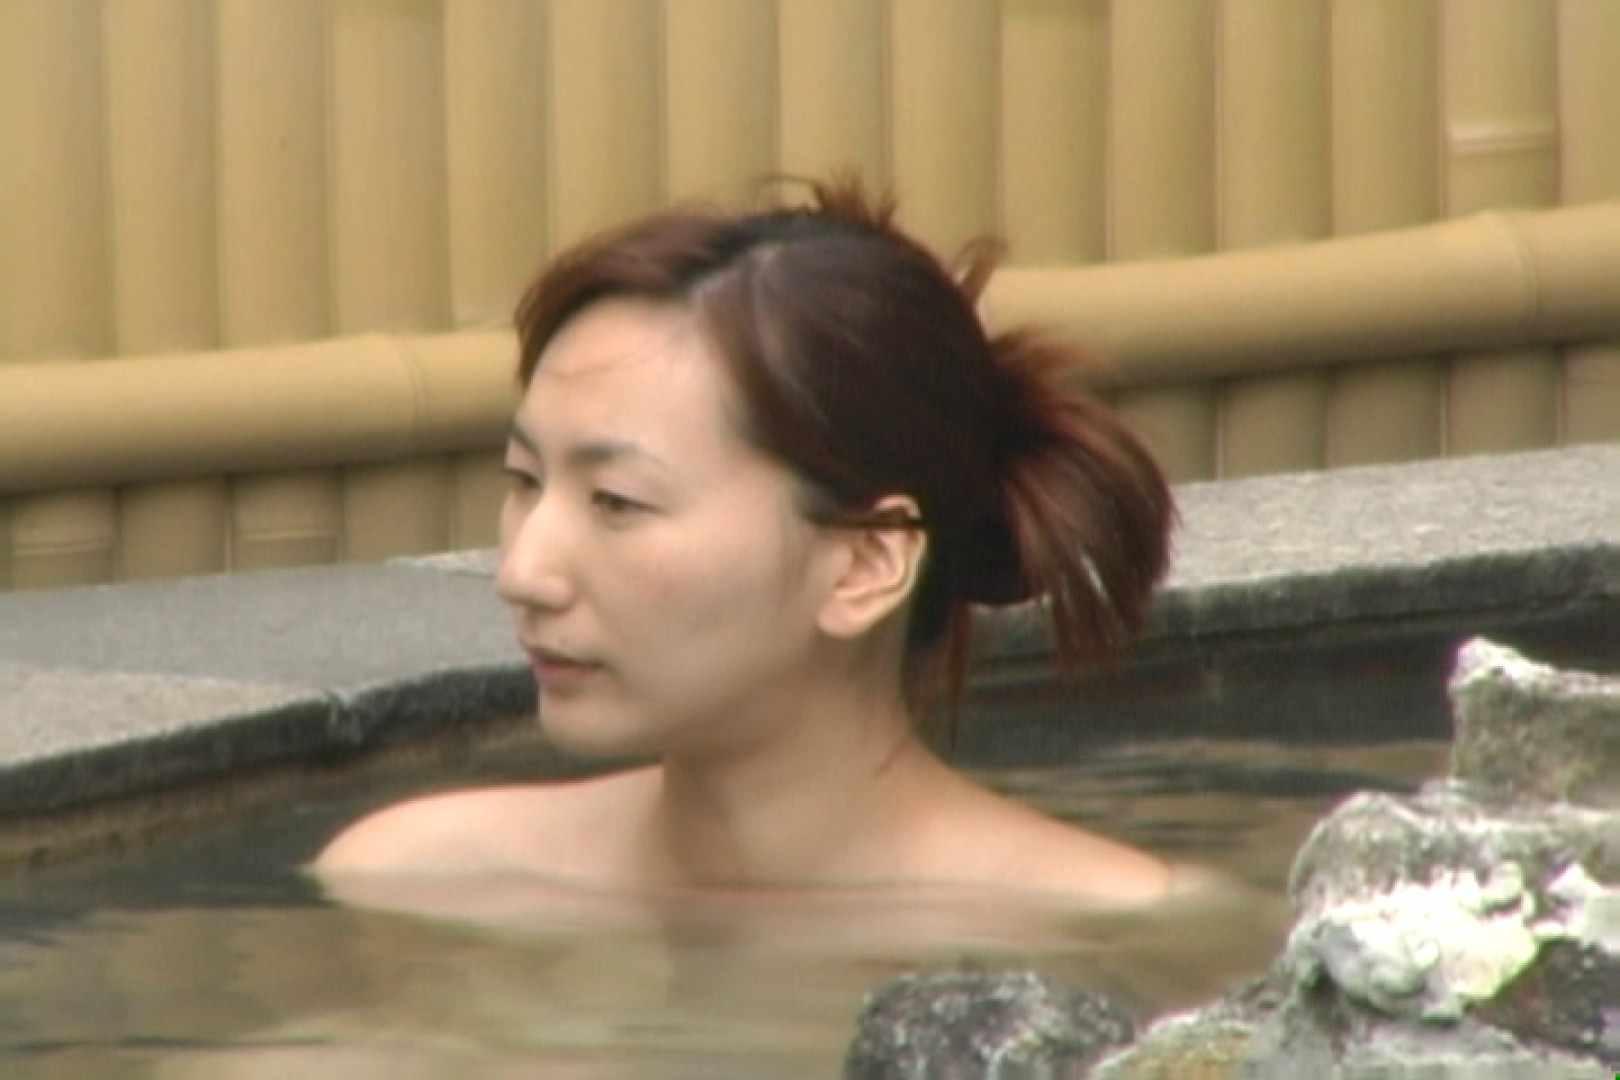 Aquaな露天風呂Vol.616 露天   OLセックス  99画像 31